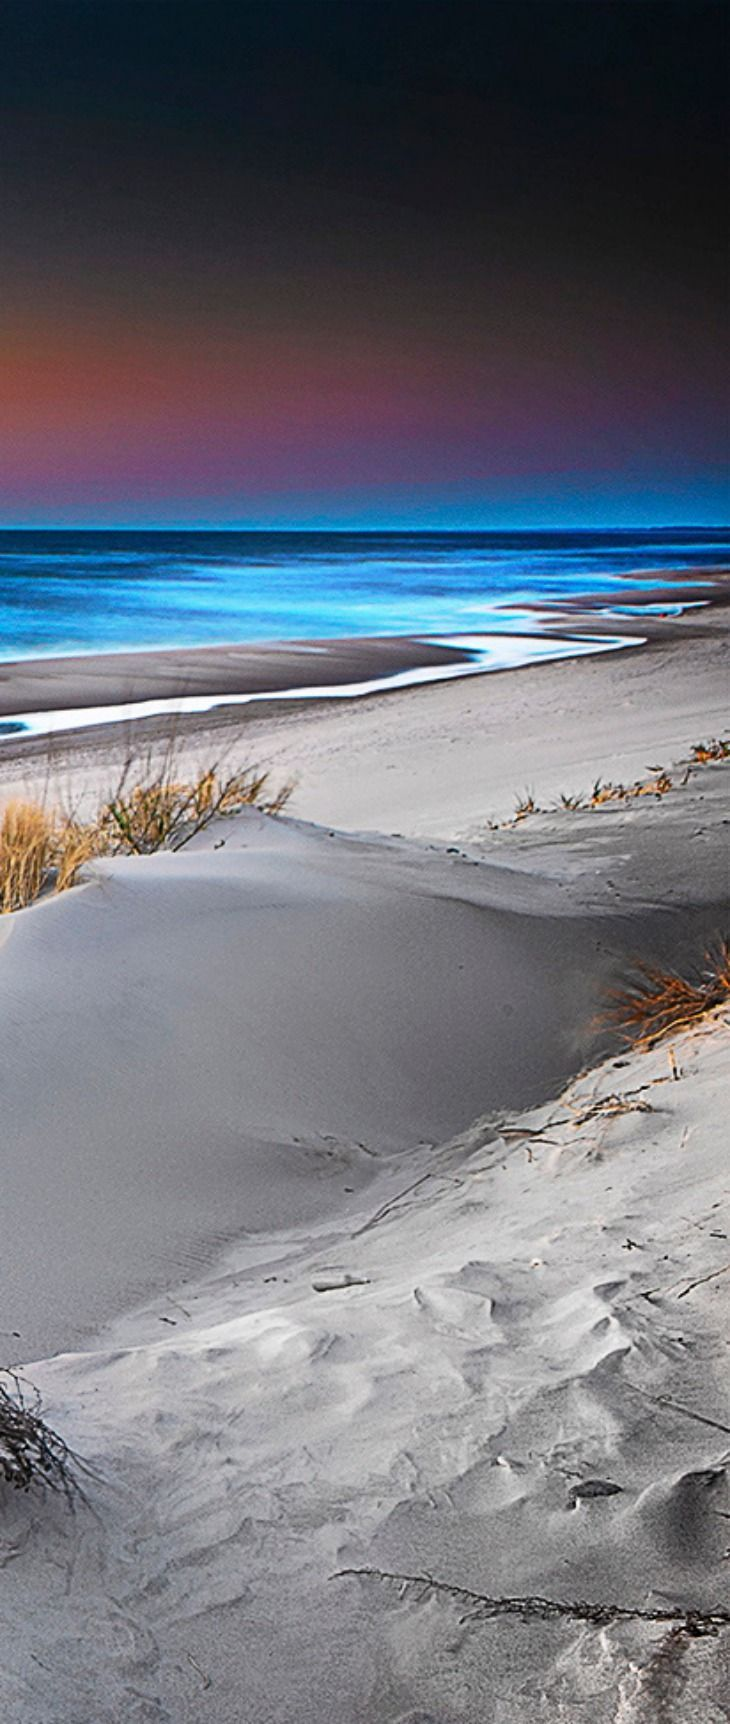 Baltic Sea, Poland by Michal Mierzehewski on 500px